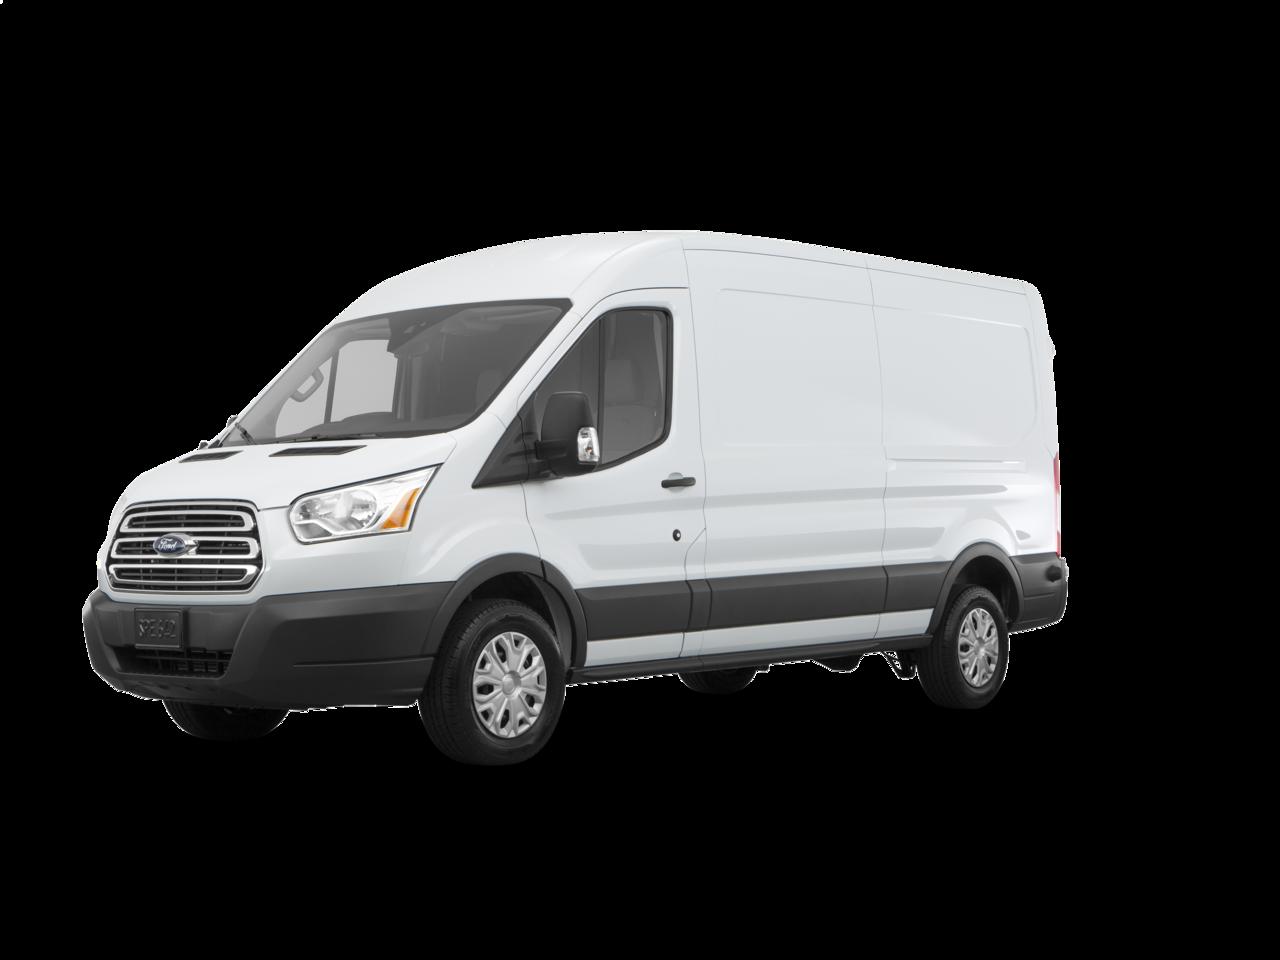 2017 Ford Transit Van 250 Medium Roof W148 Wb Dual Sliding Doors